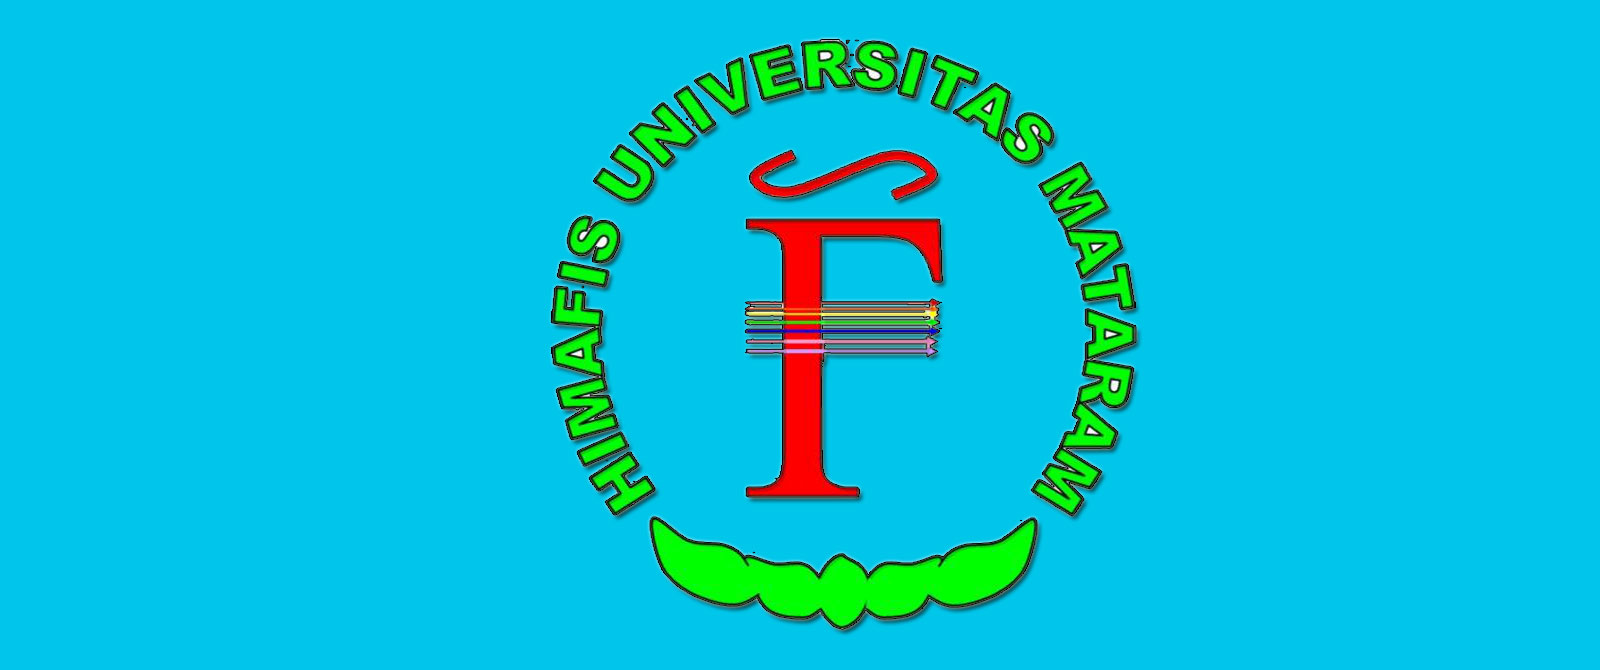 Logo Himafis Unram